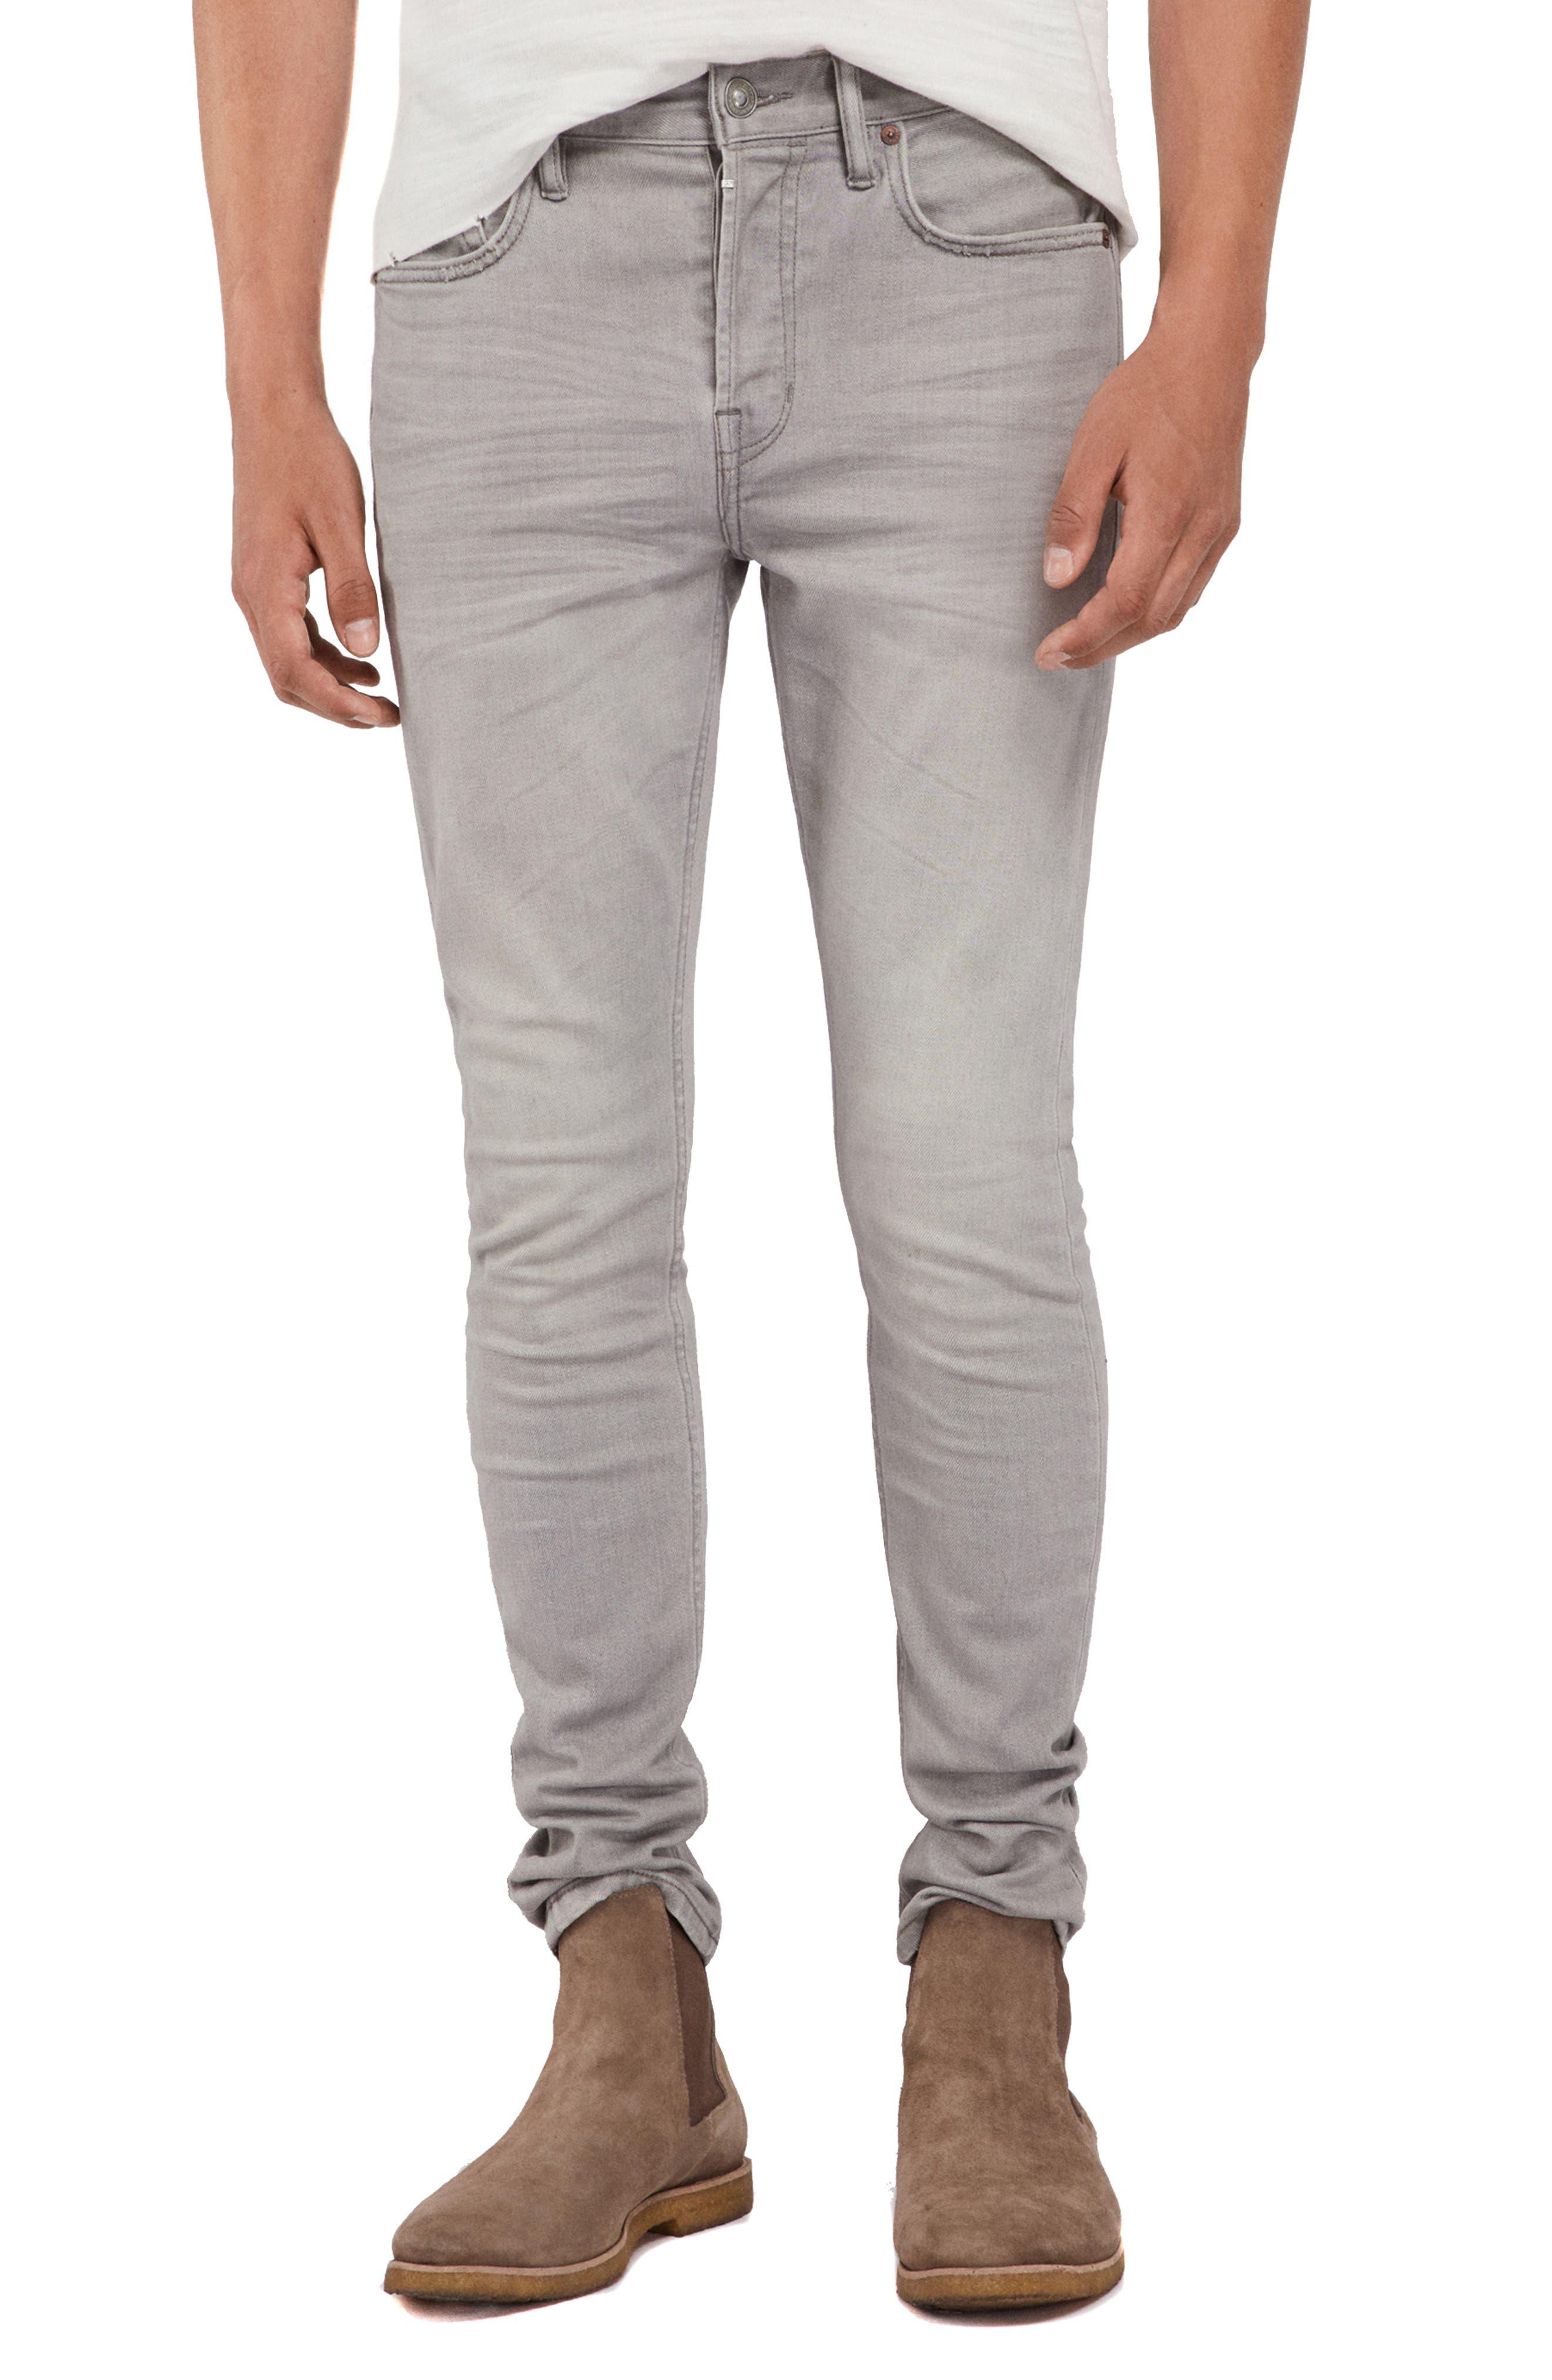 ALLSAINTS, Raveline Cigarette Skinny Fit Jeans, Main thumbnail 1, color, GREY